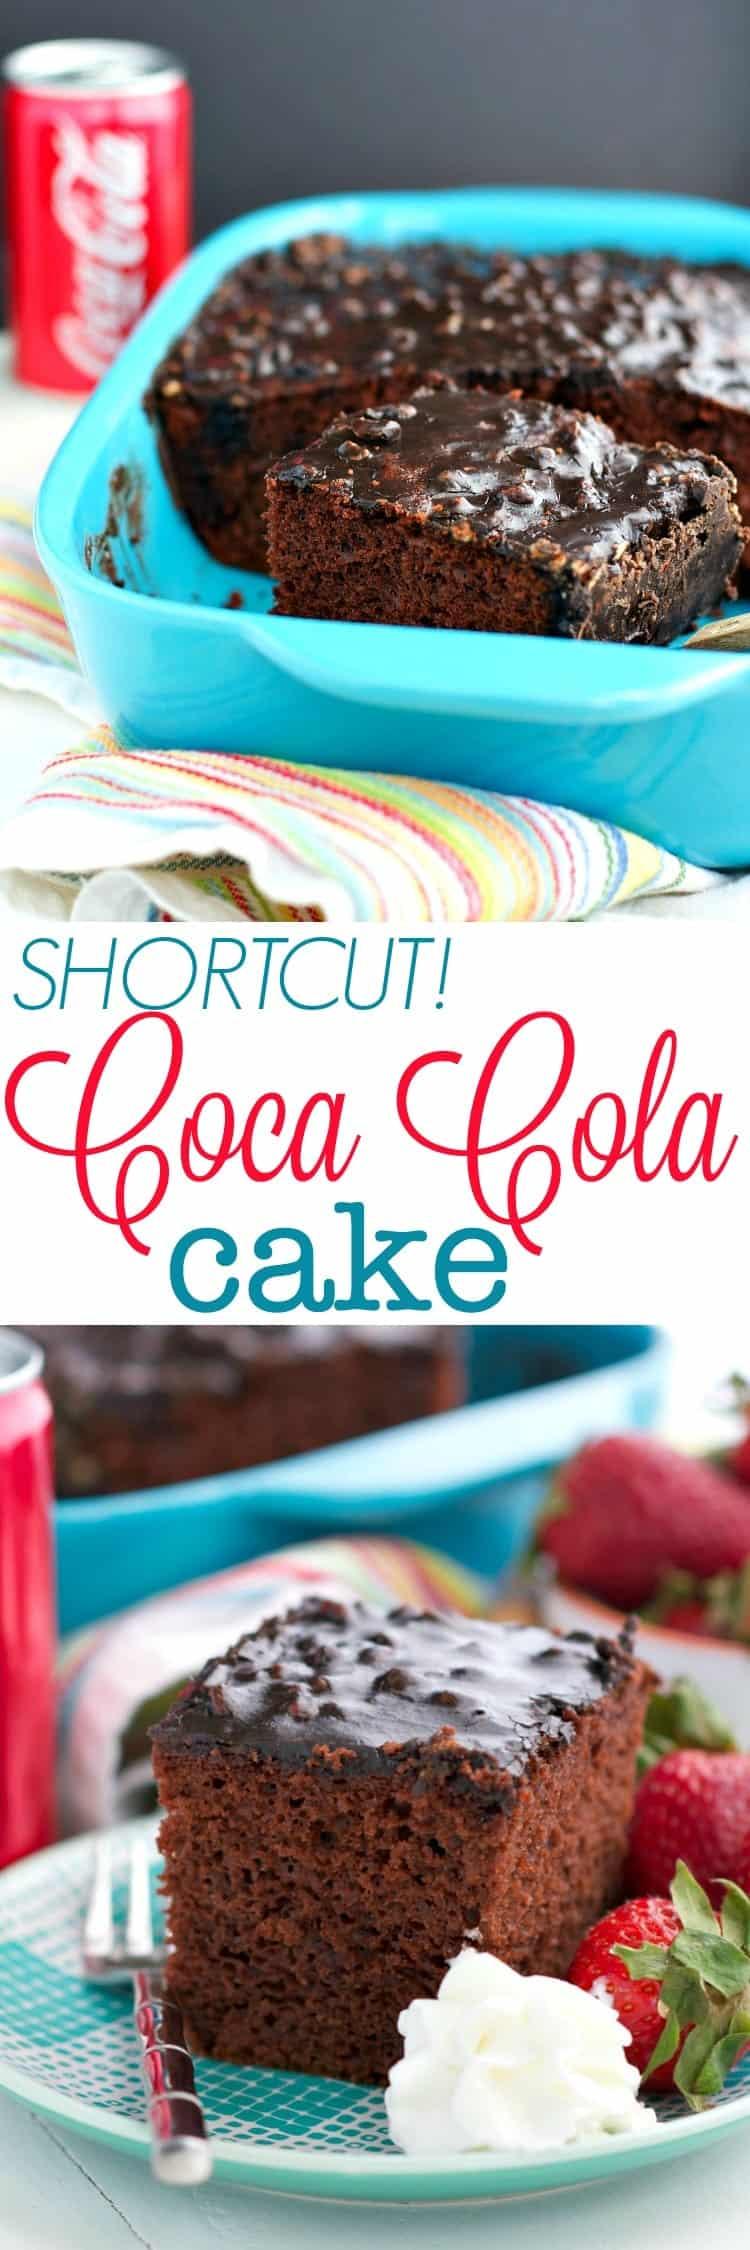 Chocolate Cake Mix Coke Recipe